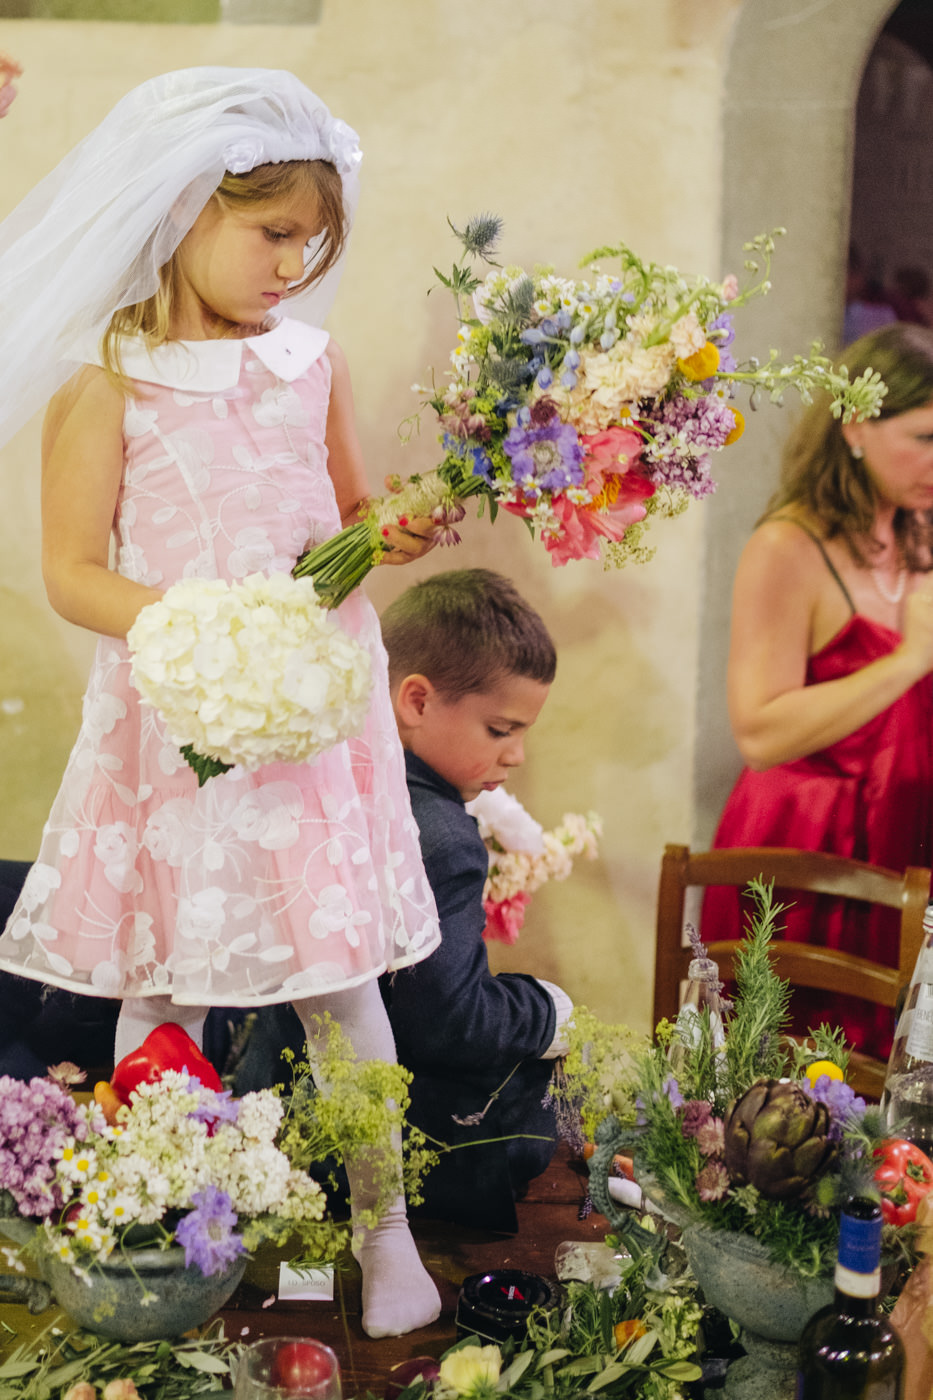 matrimoni_all_italiana_fotografo_matrimonio_toscana-81.jpg